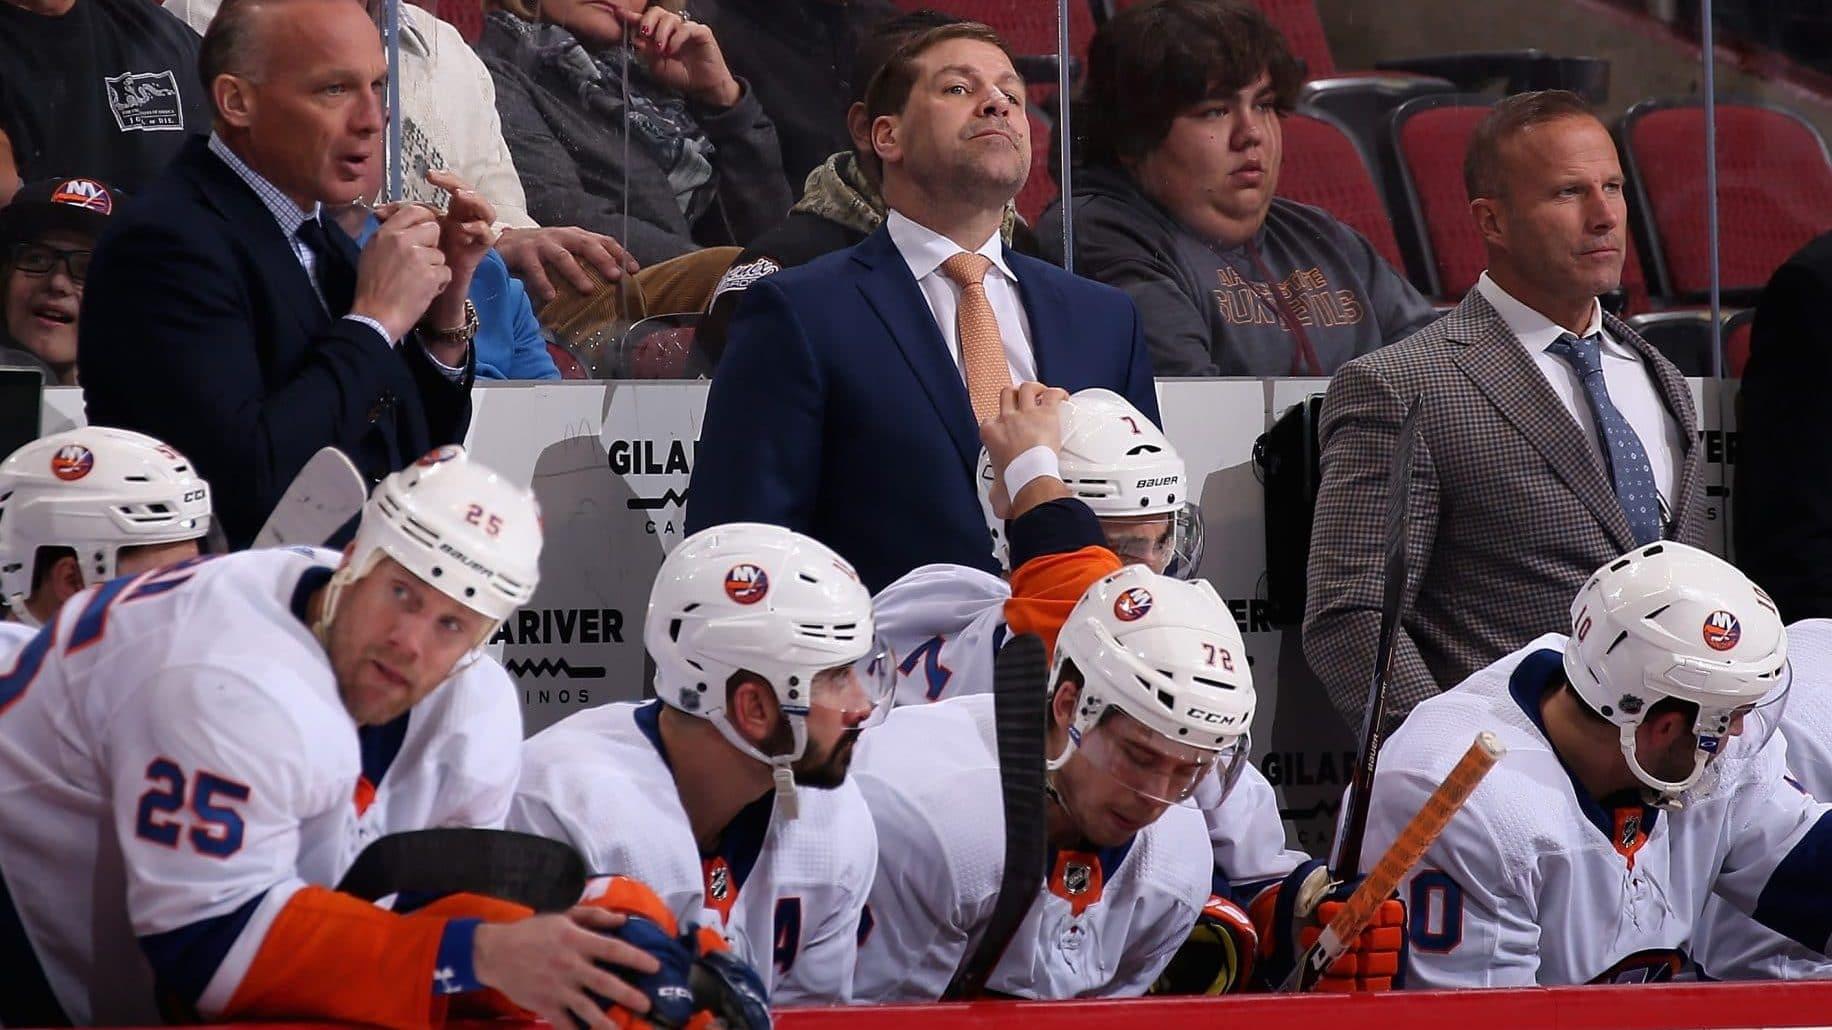 New York Islanders, Doug Weight, Arizona Coyotes, Gila River Arena